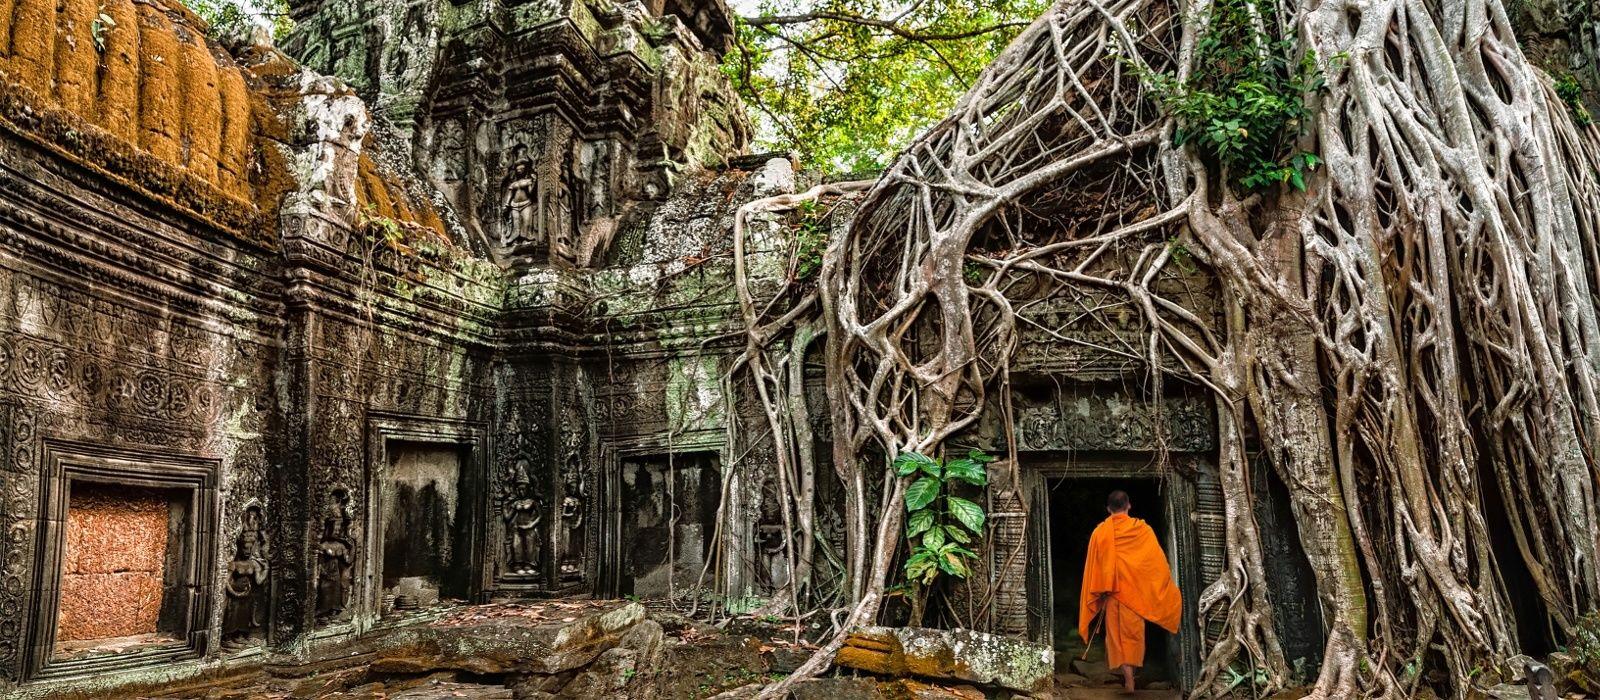 Spektakuläre Tempelbauten im Dschungel